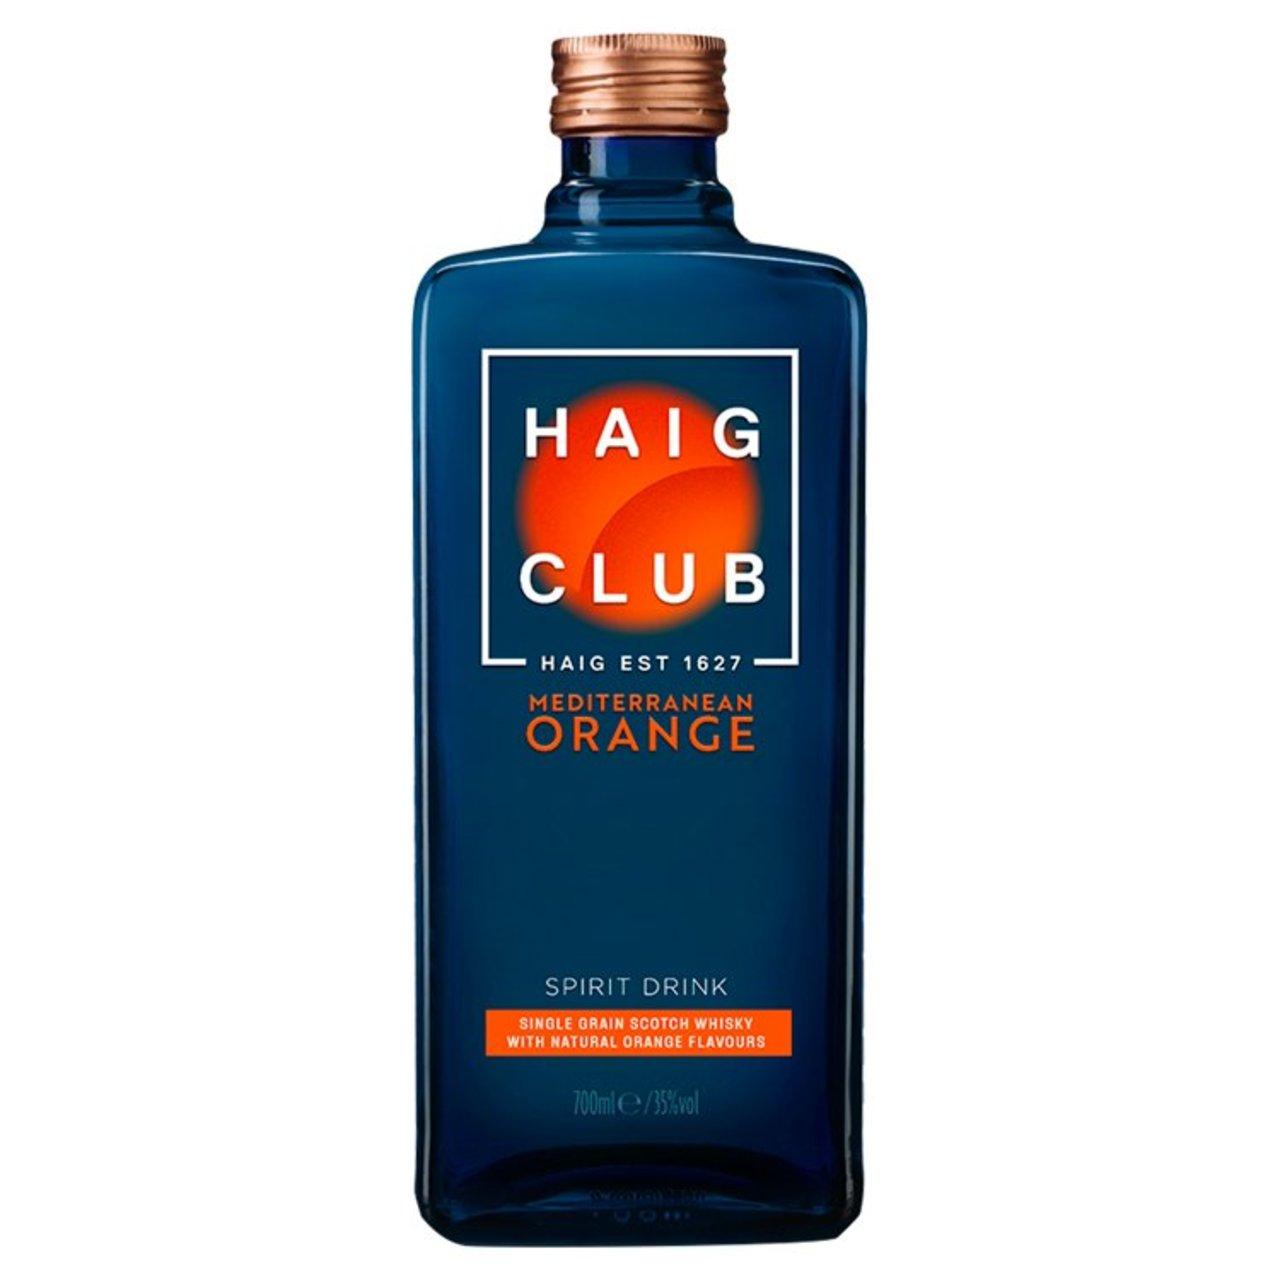 Haig Club Mediterranean Orange Scotch whisky Spirit Drink £16 introductory offer instore at Morrisons Felixstowe